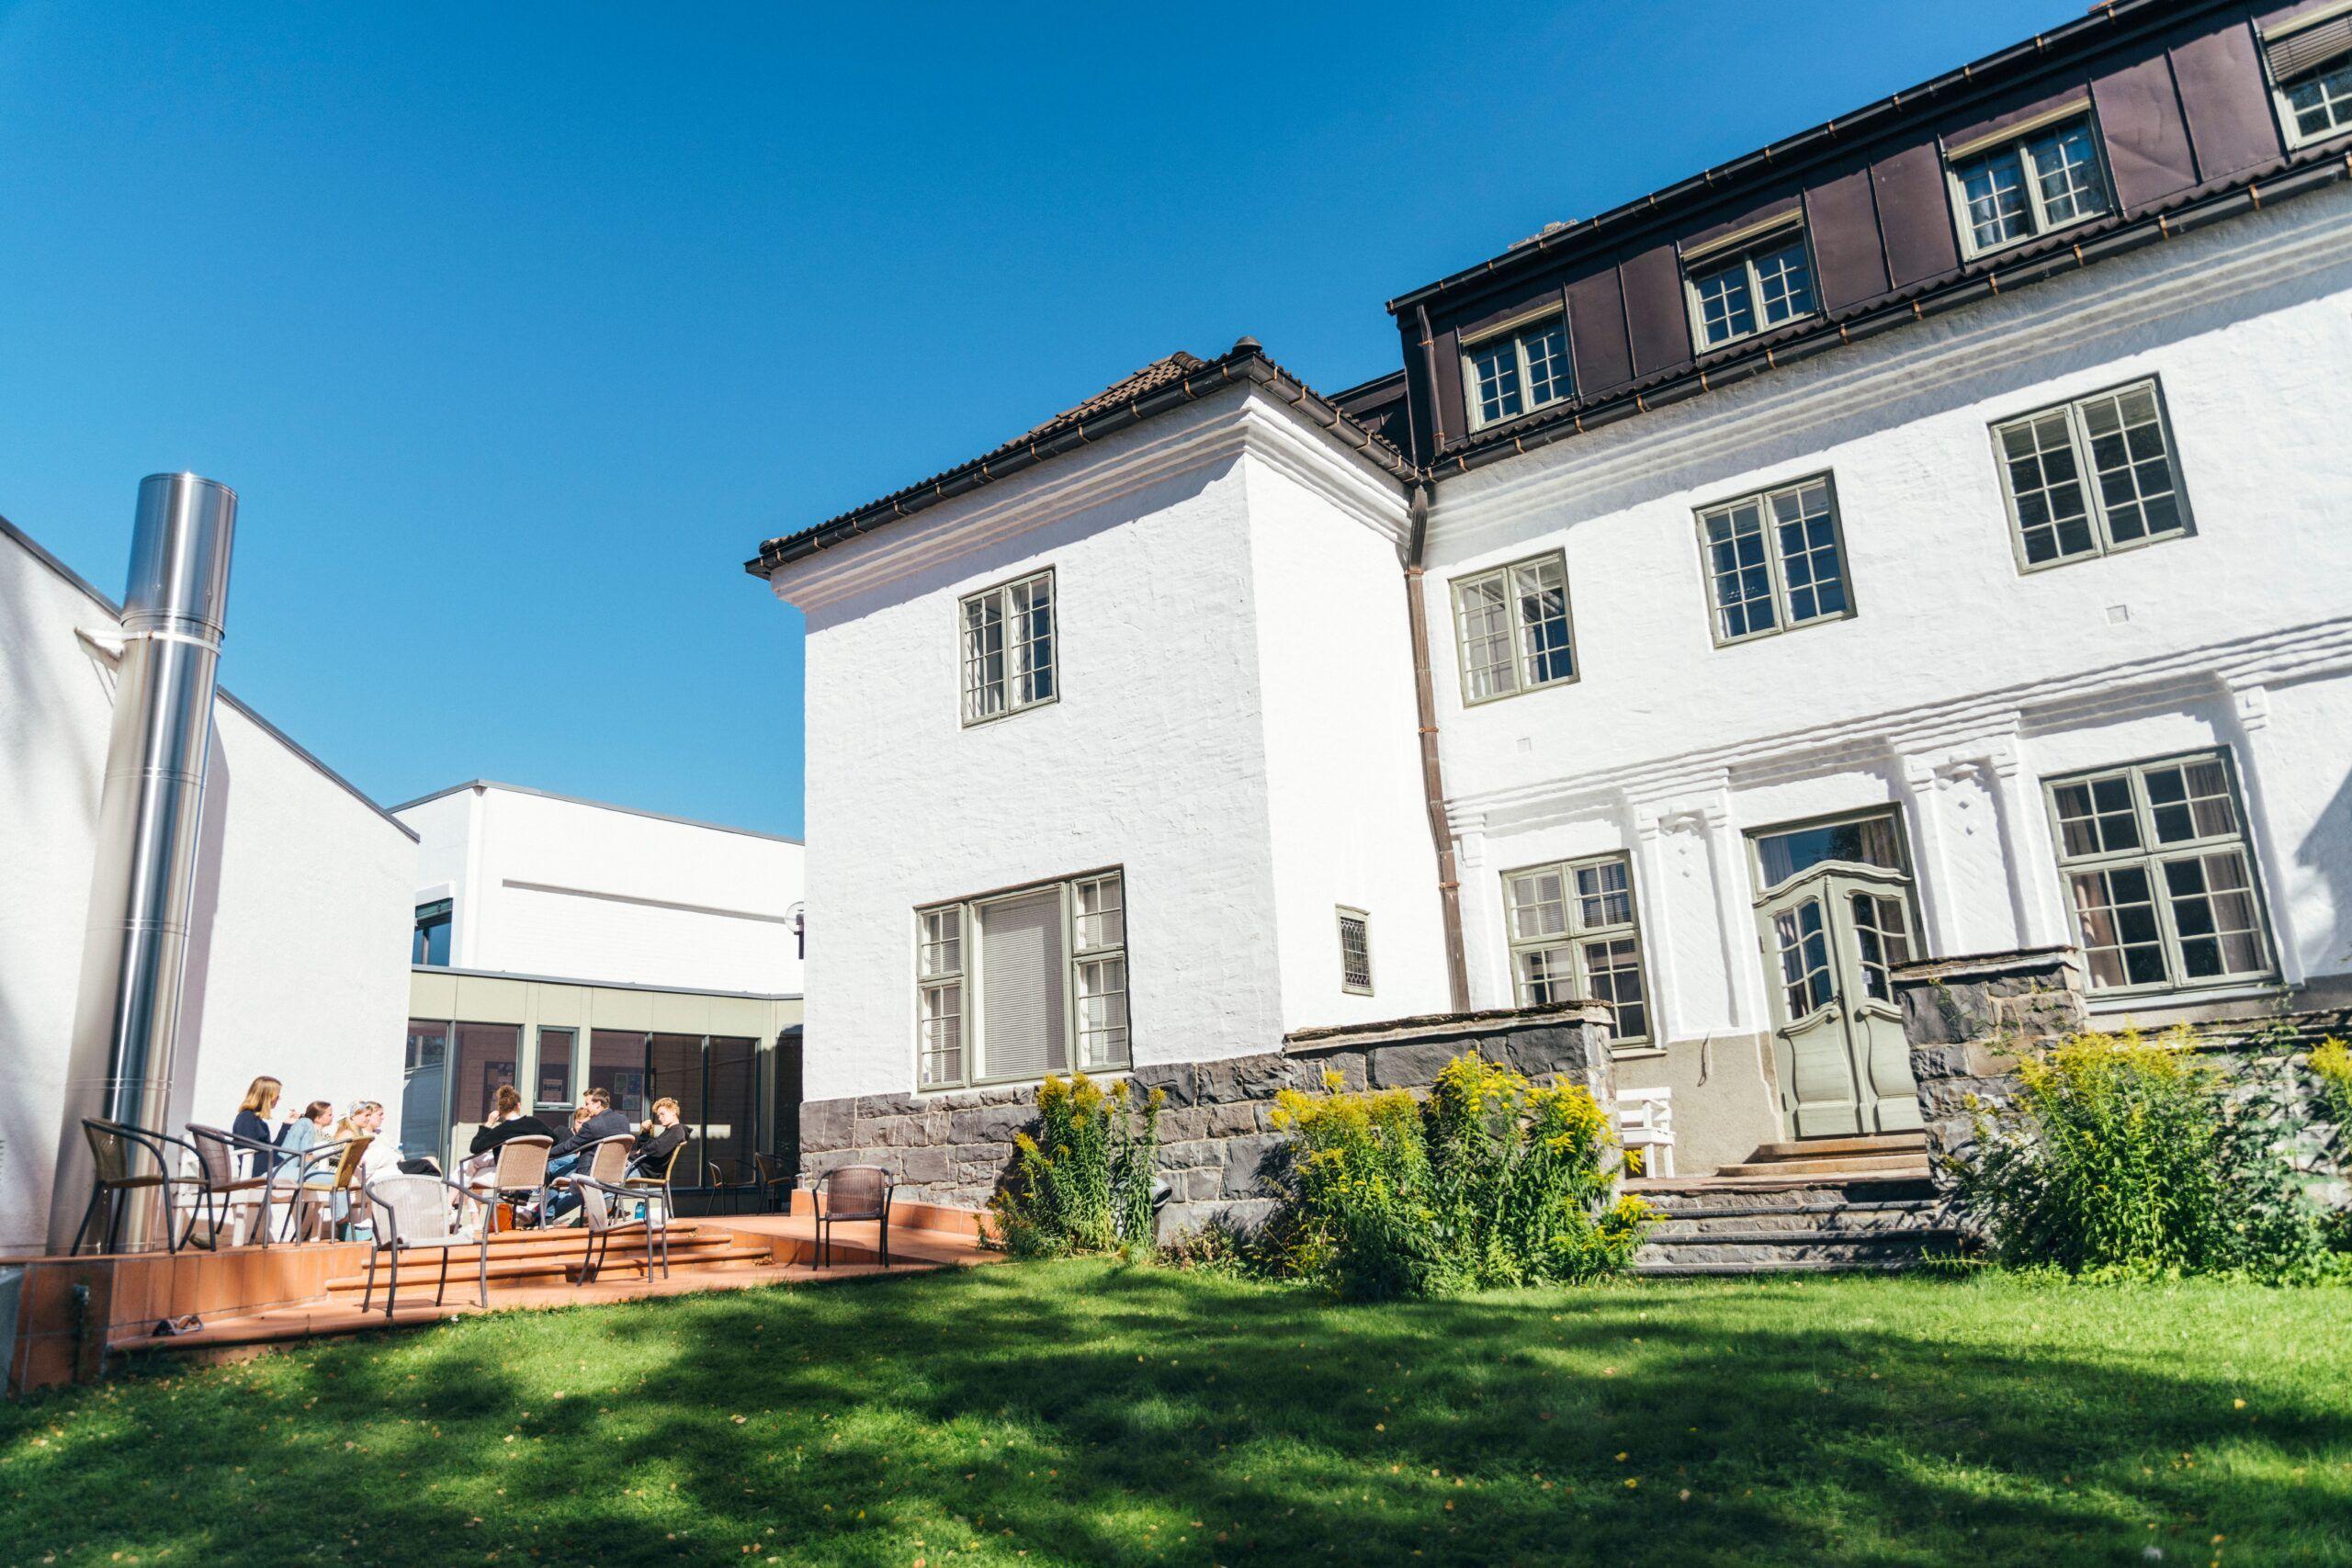 Nansenskolens hage med studenter